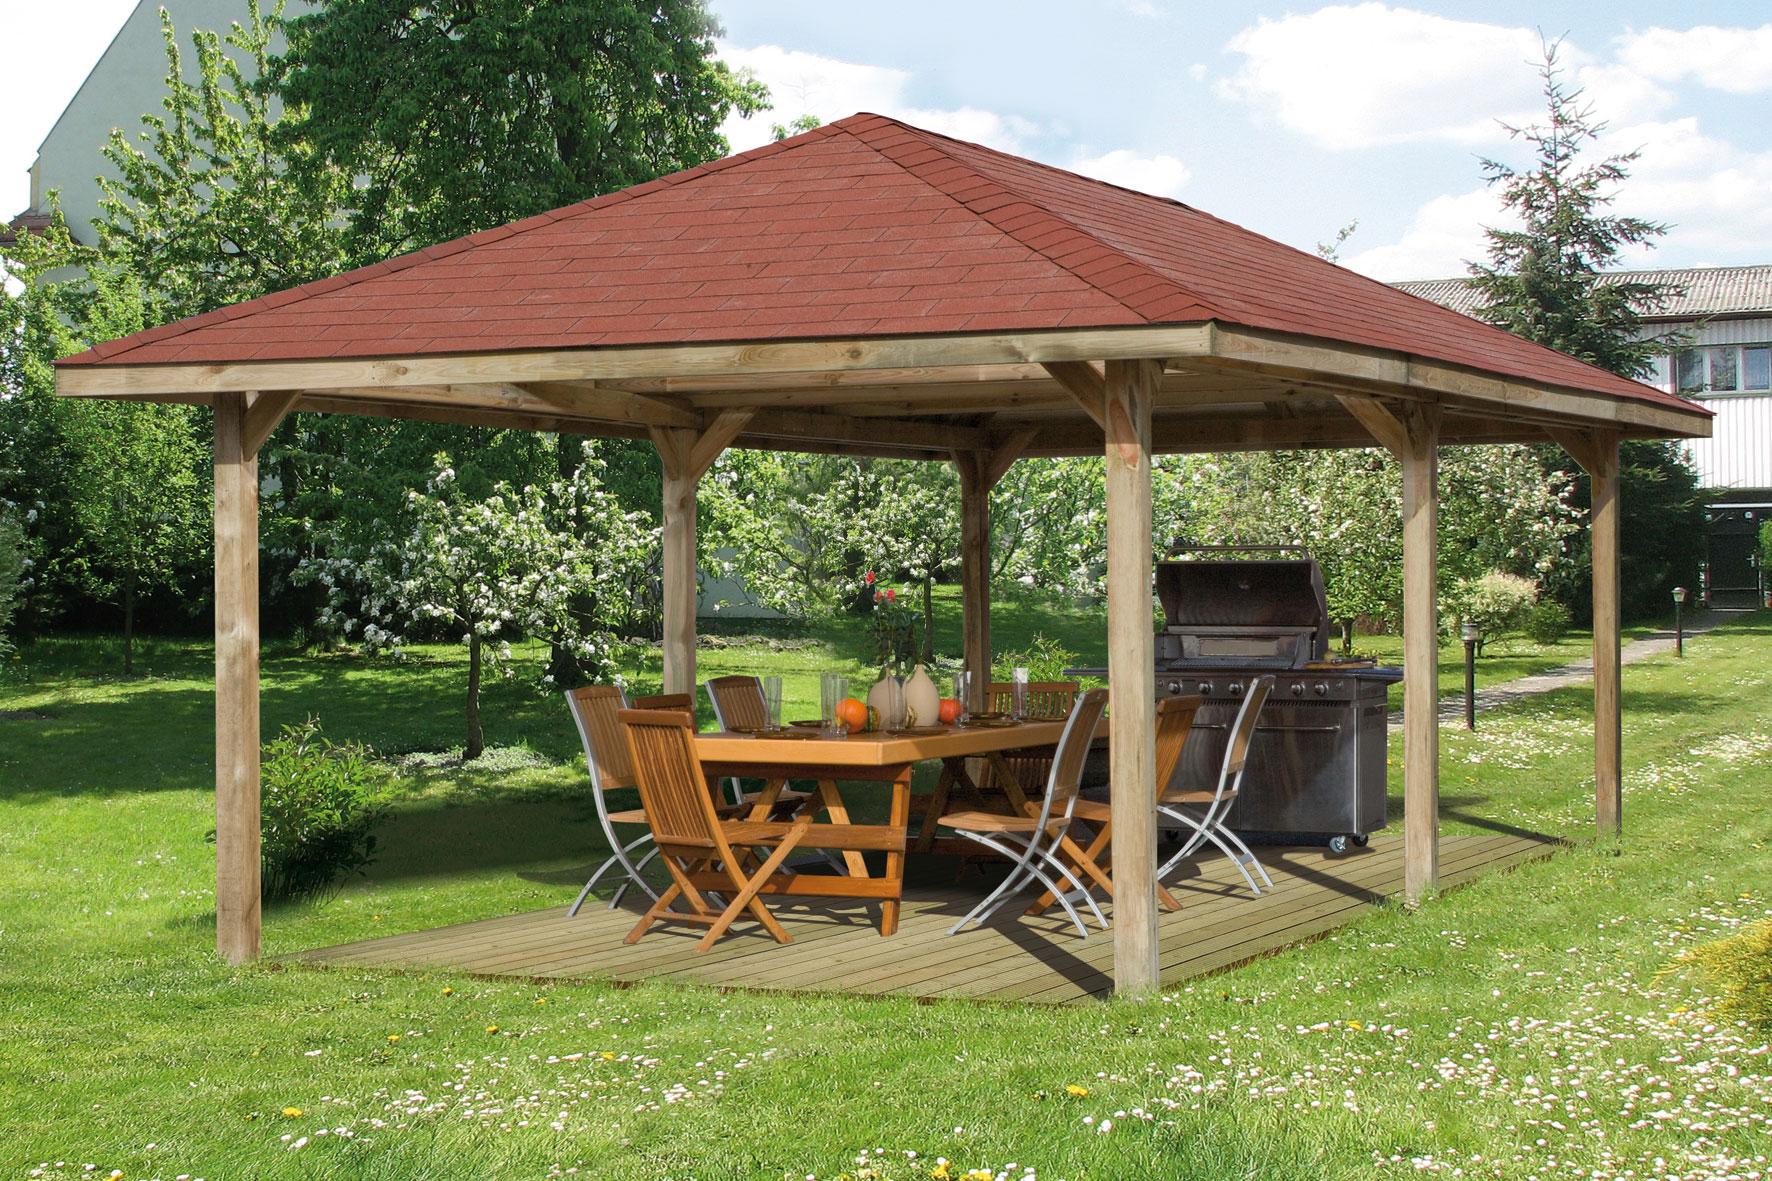 Weka Pavillon / Carport Gartenoase 651D Gr.3 kdi 778x433cm Bild 1